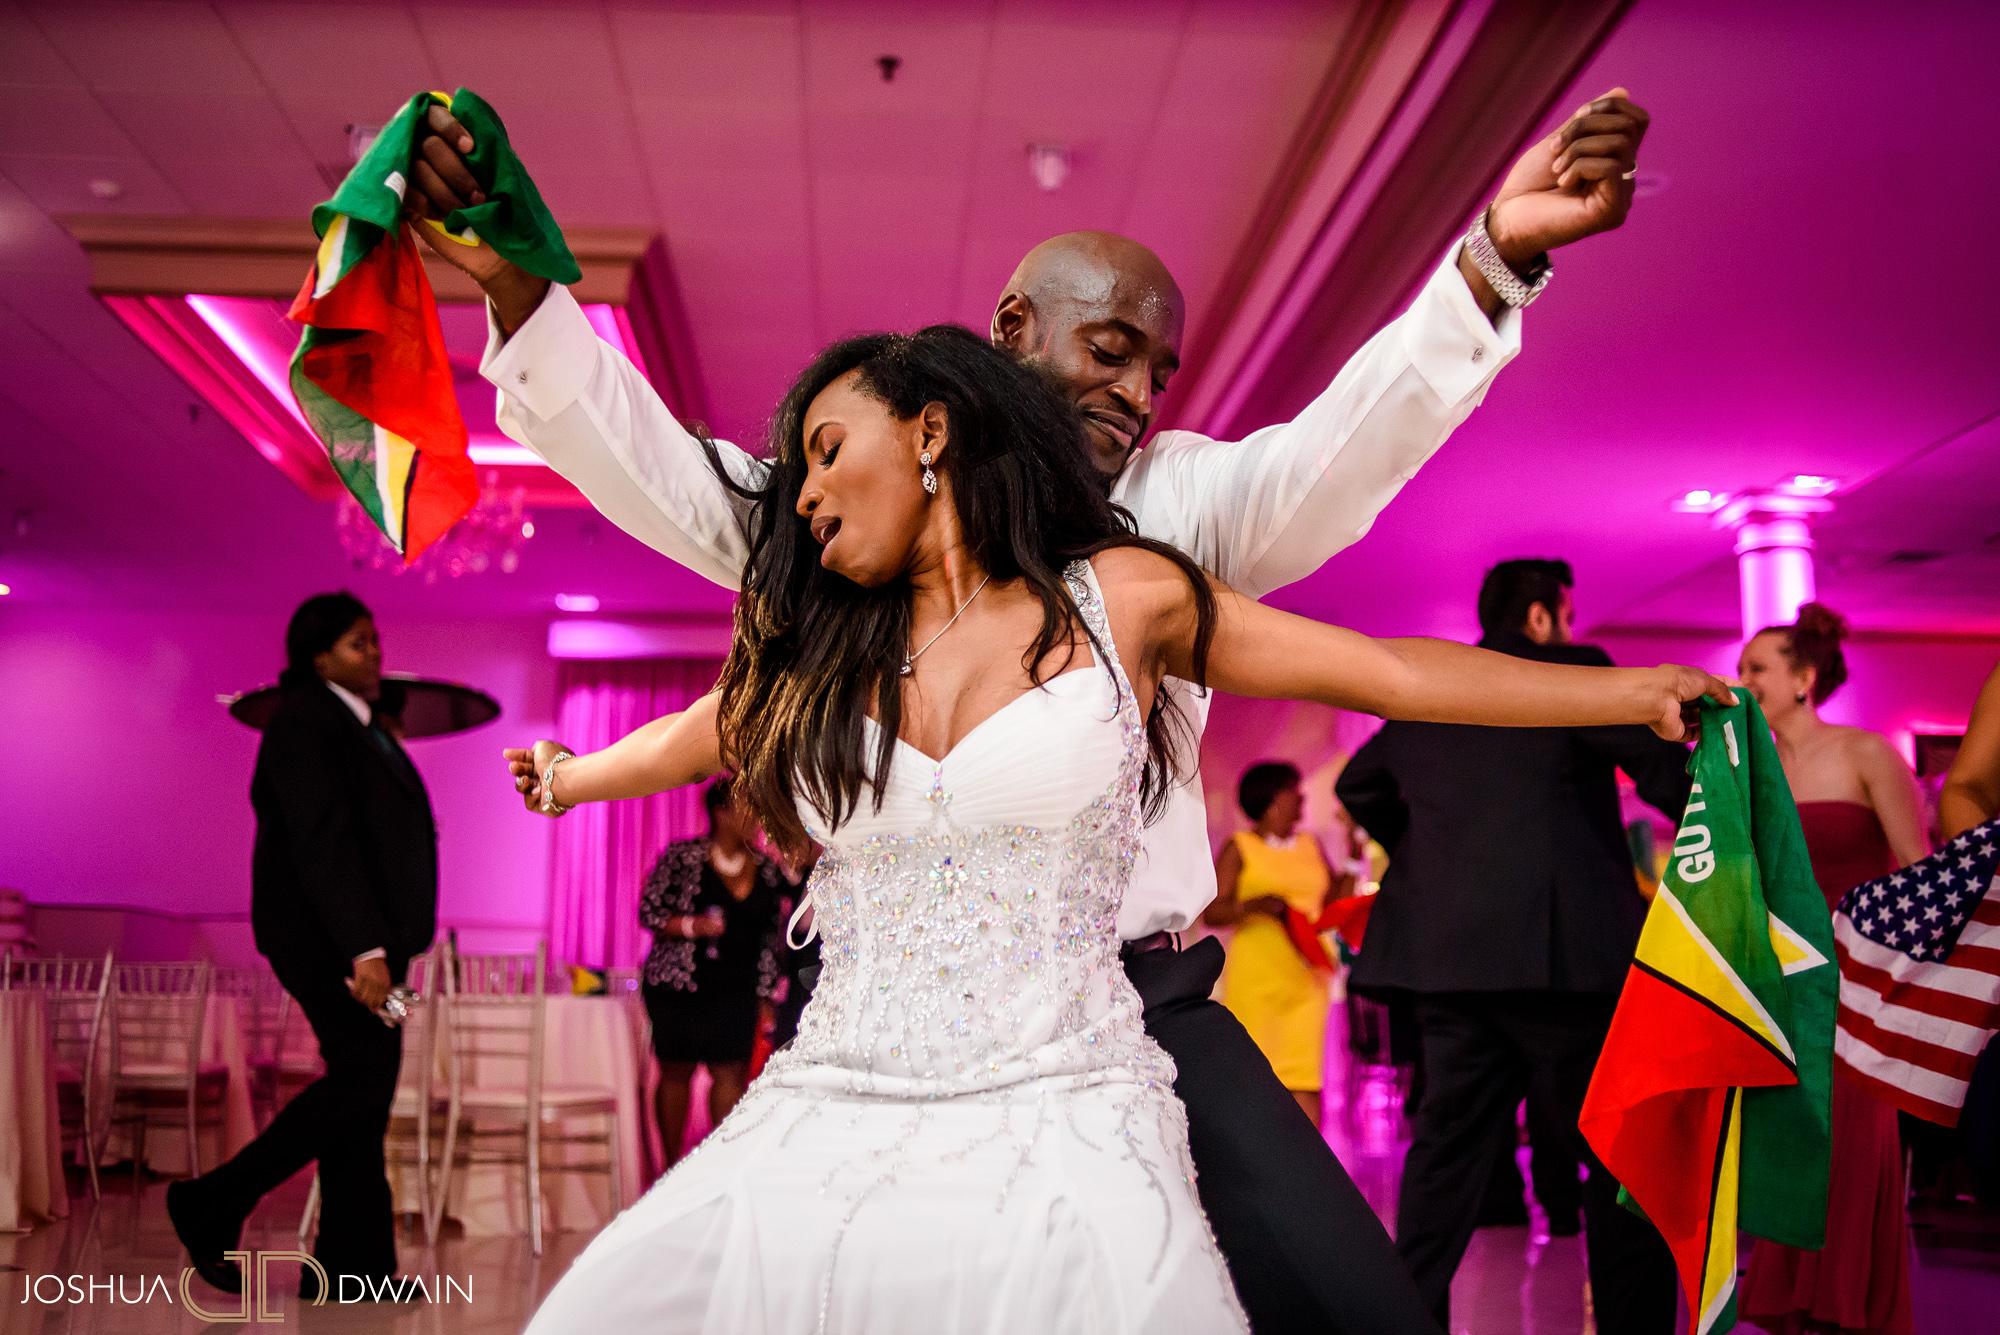 victorious-events-nyc-035-alana-vibert-greentree-country-club-wedding-joshua-dwain.jpg